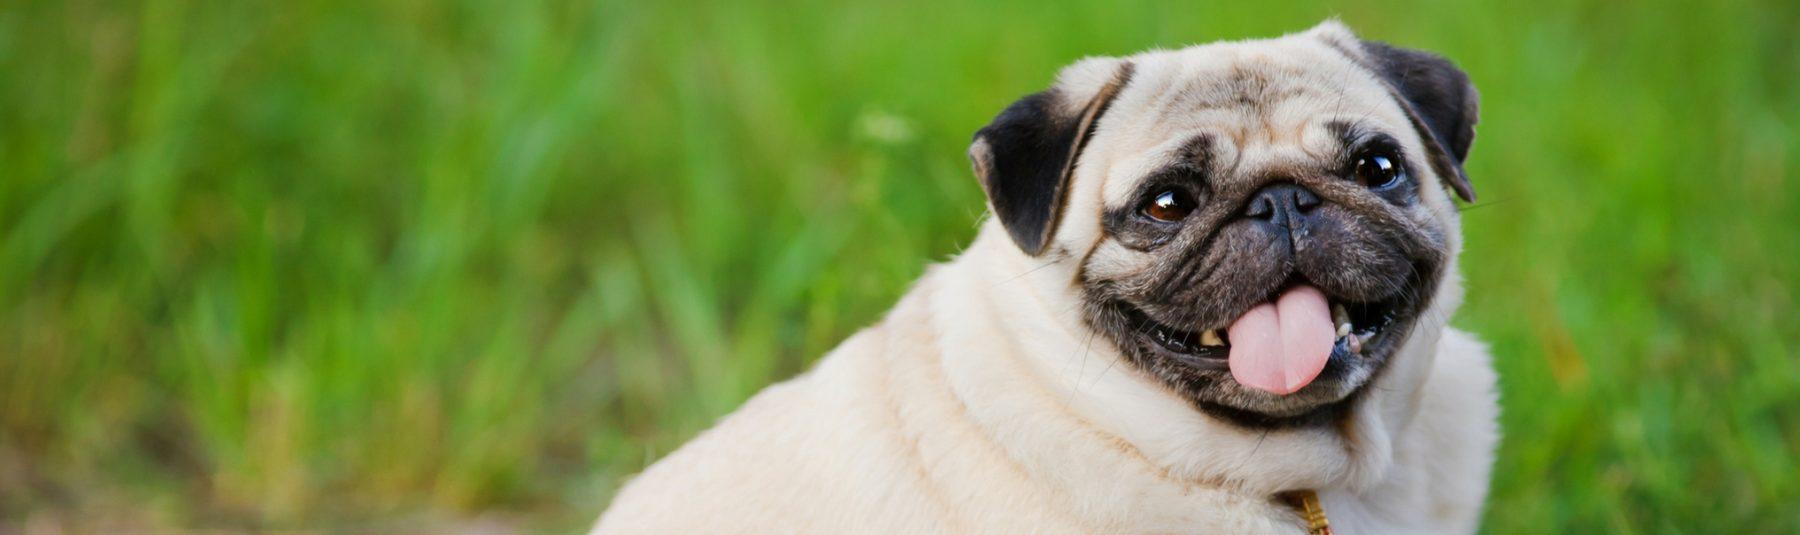 dog-overweight